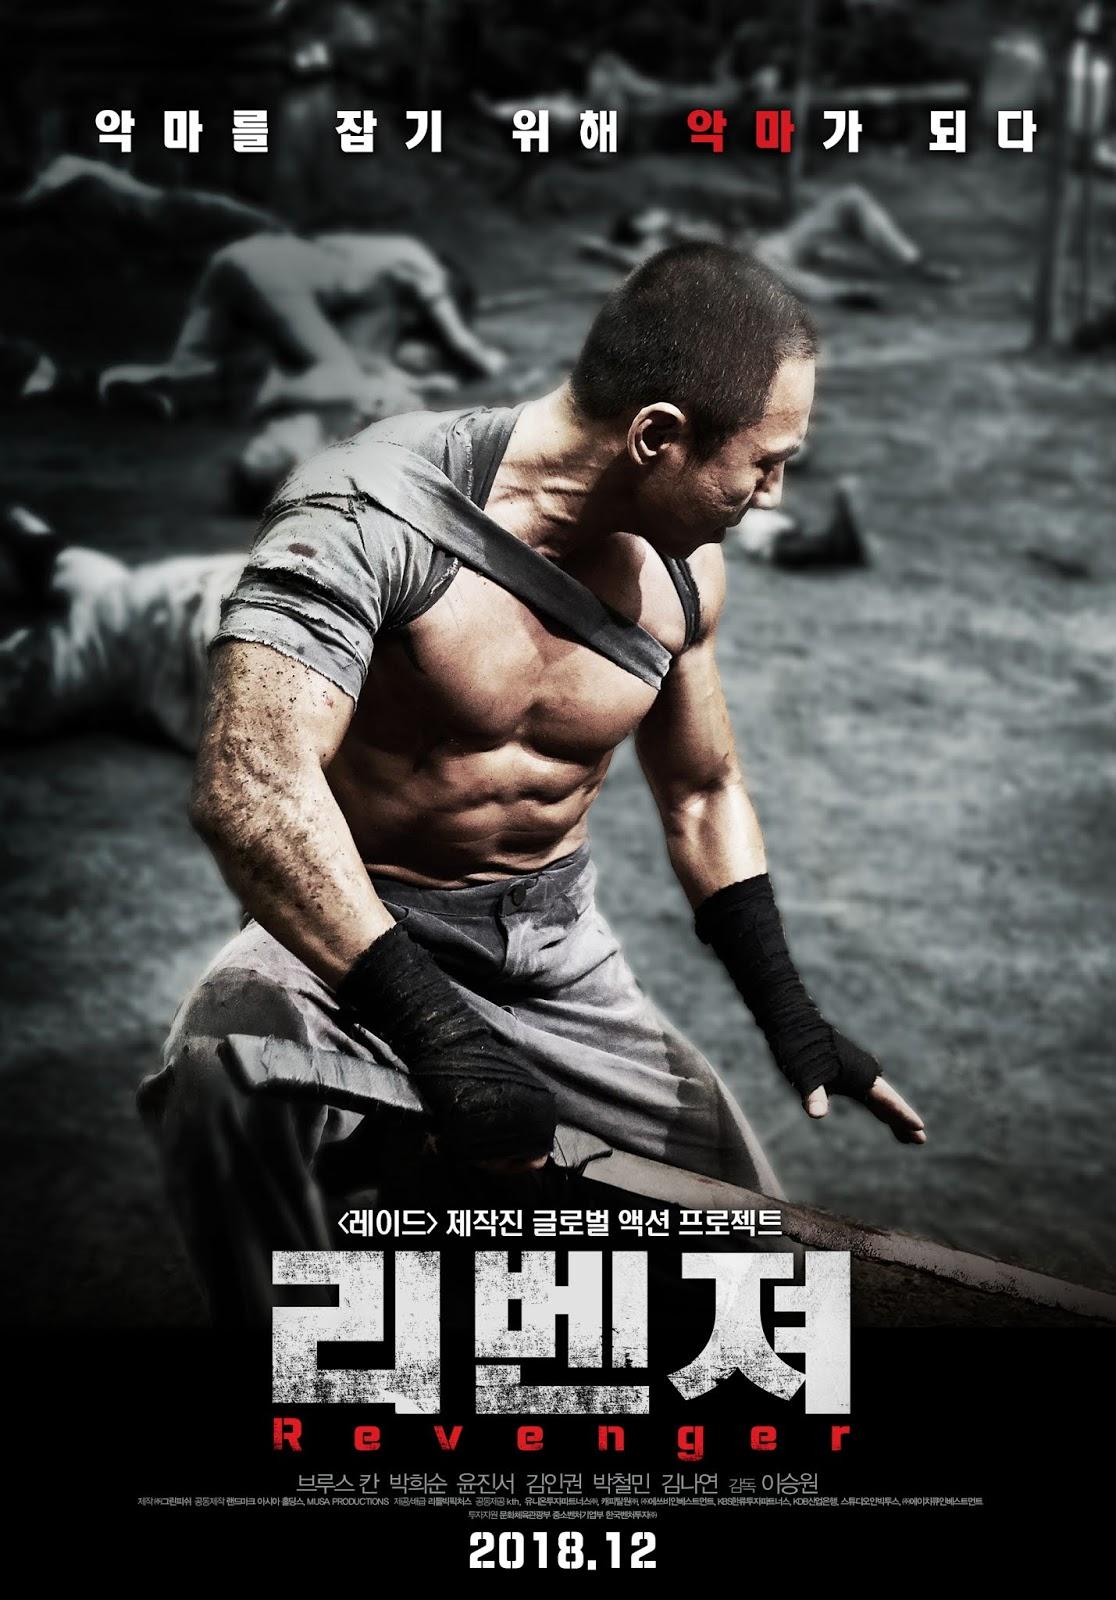 Revenger (2019) หนี้เลือดคุกทมิฬ (ซับไทย)